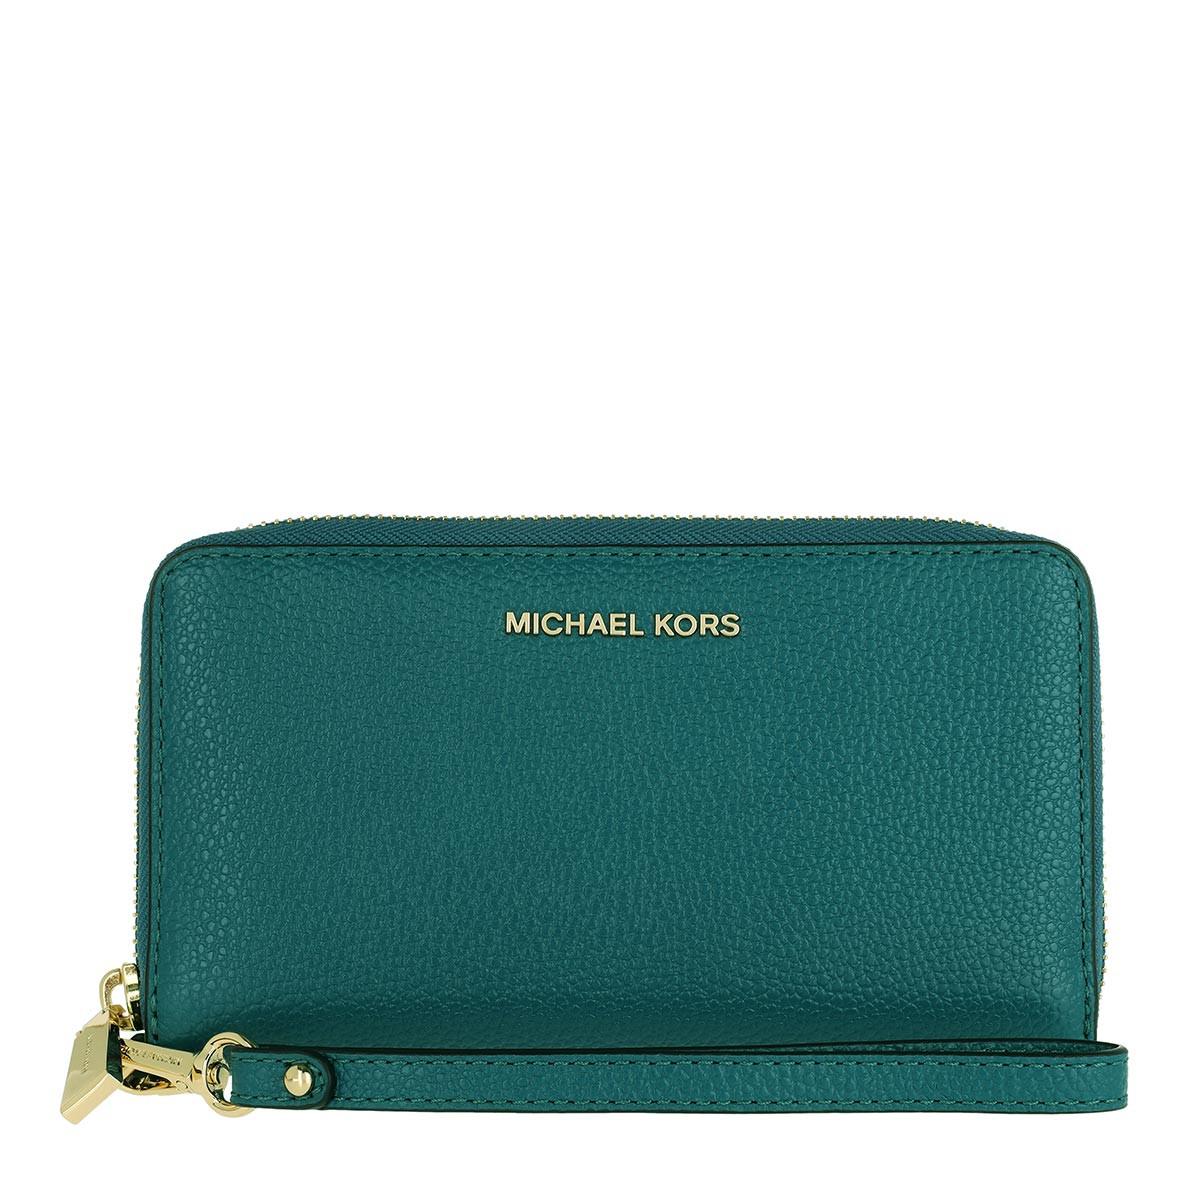 Michael Kors Portemonnaie - Large Flat Multifunction Phone Case Dark Cyan - in grün - für Damen